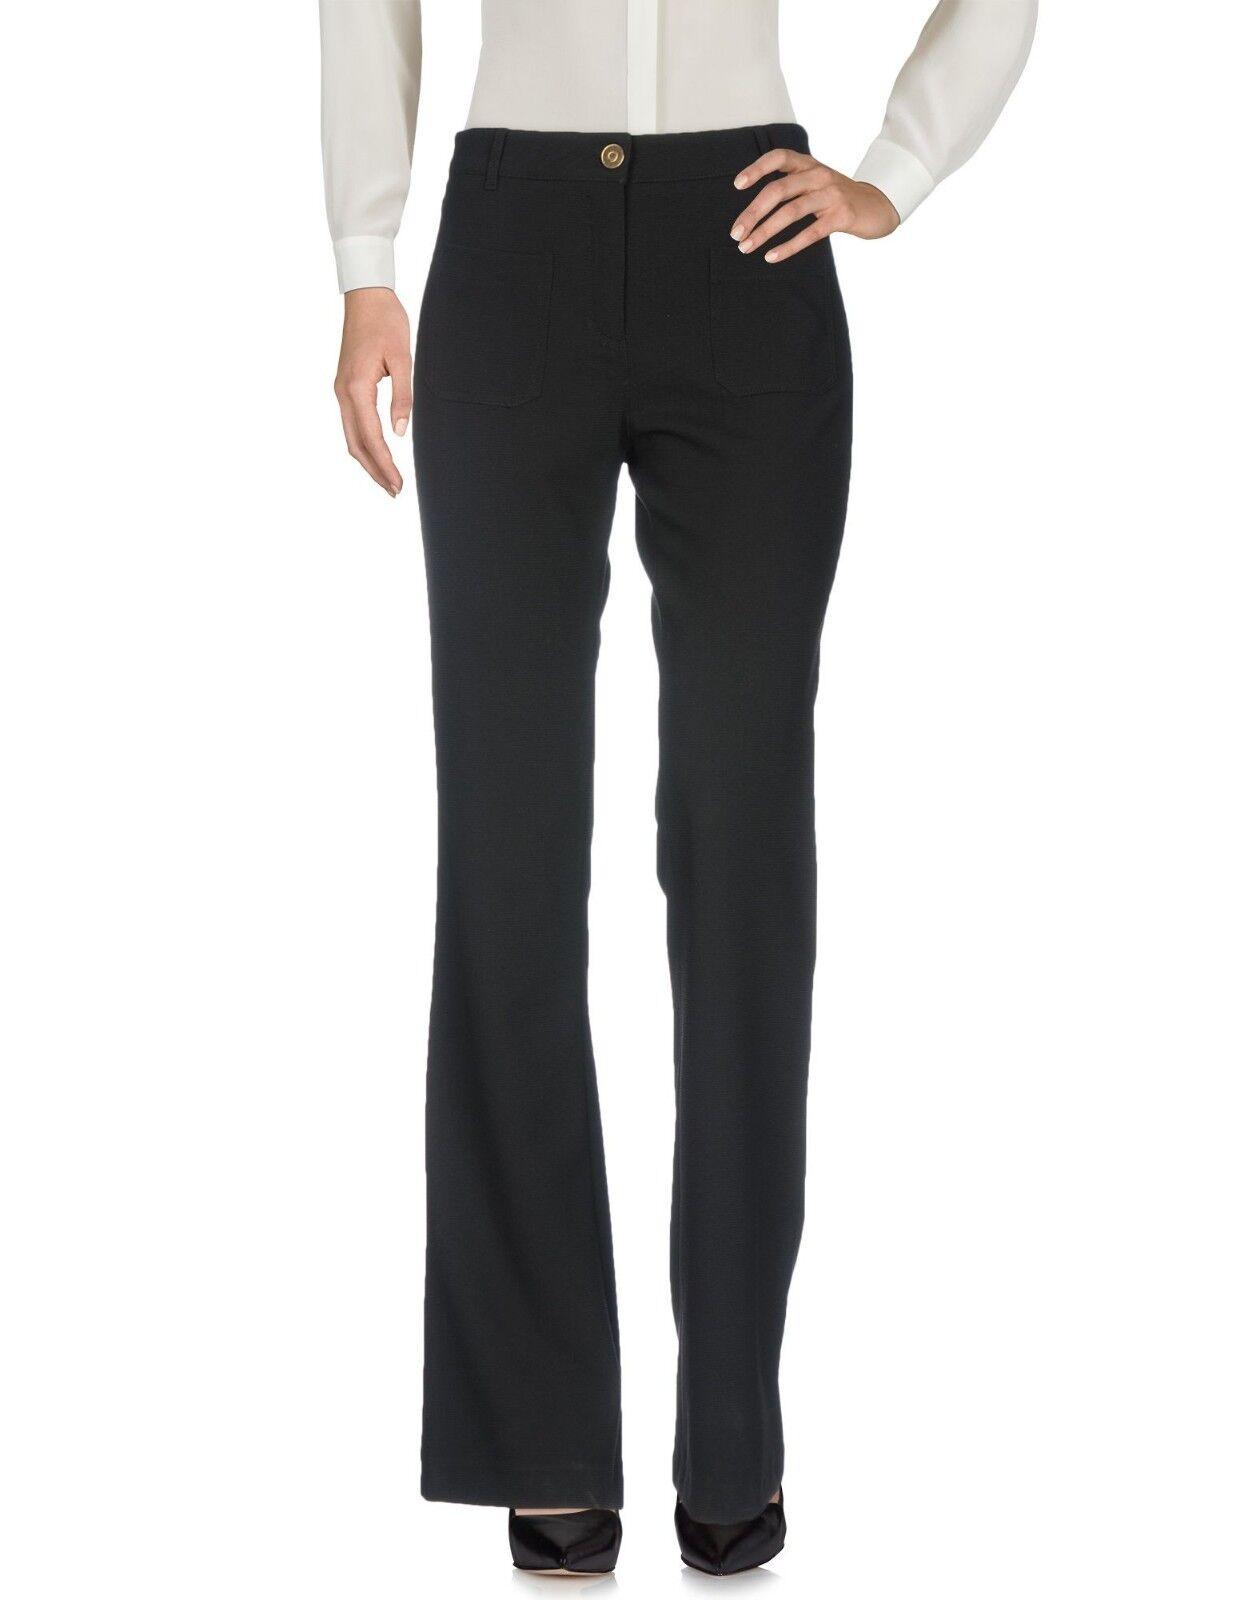 Pantaloni Donna  viola ATOS LOMBARDINI Made in  H980 Tg 42